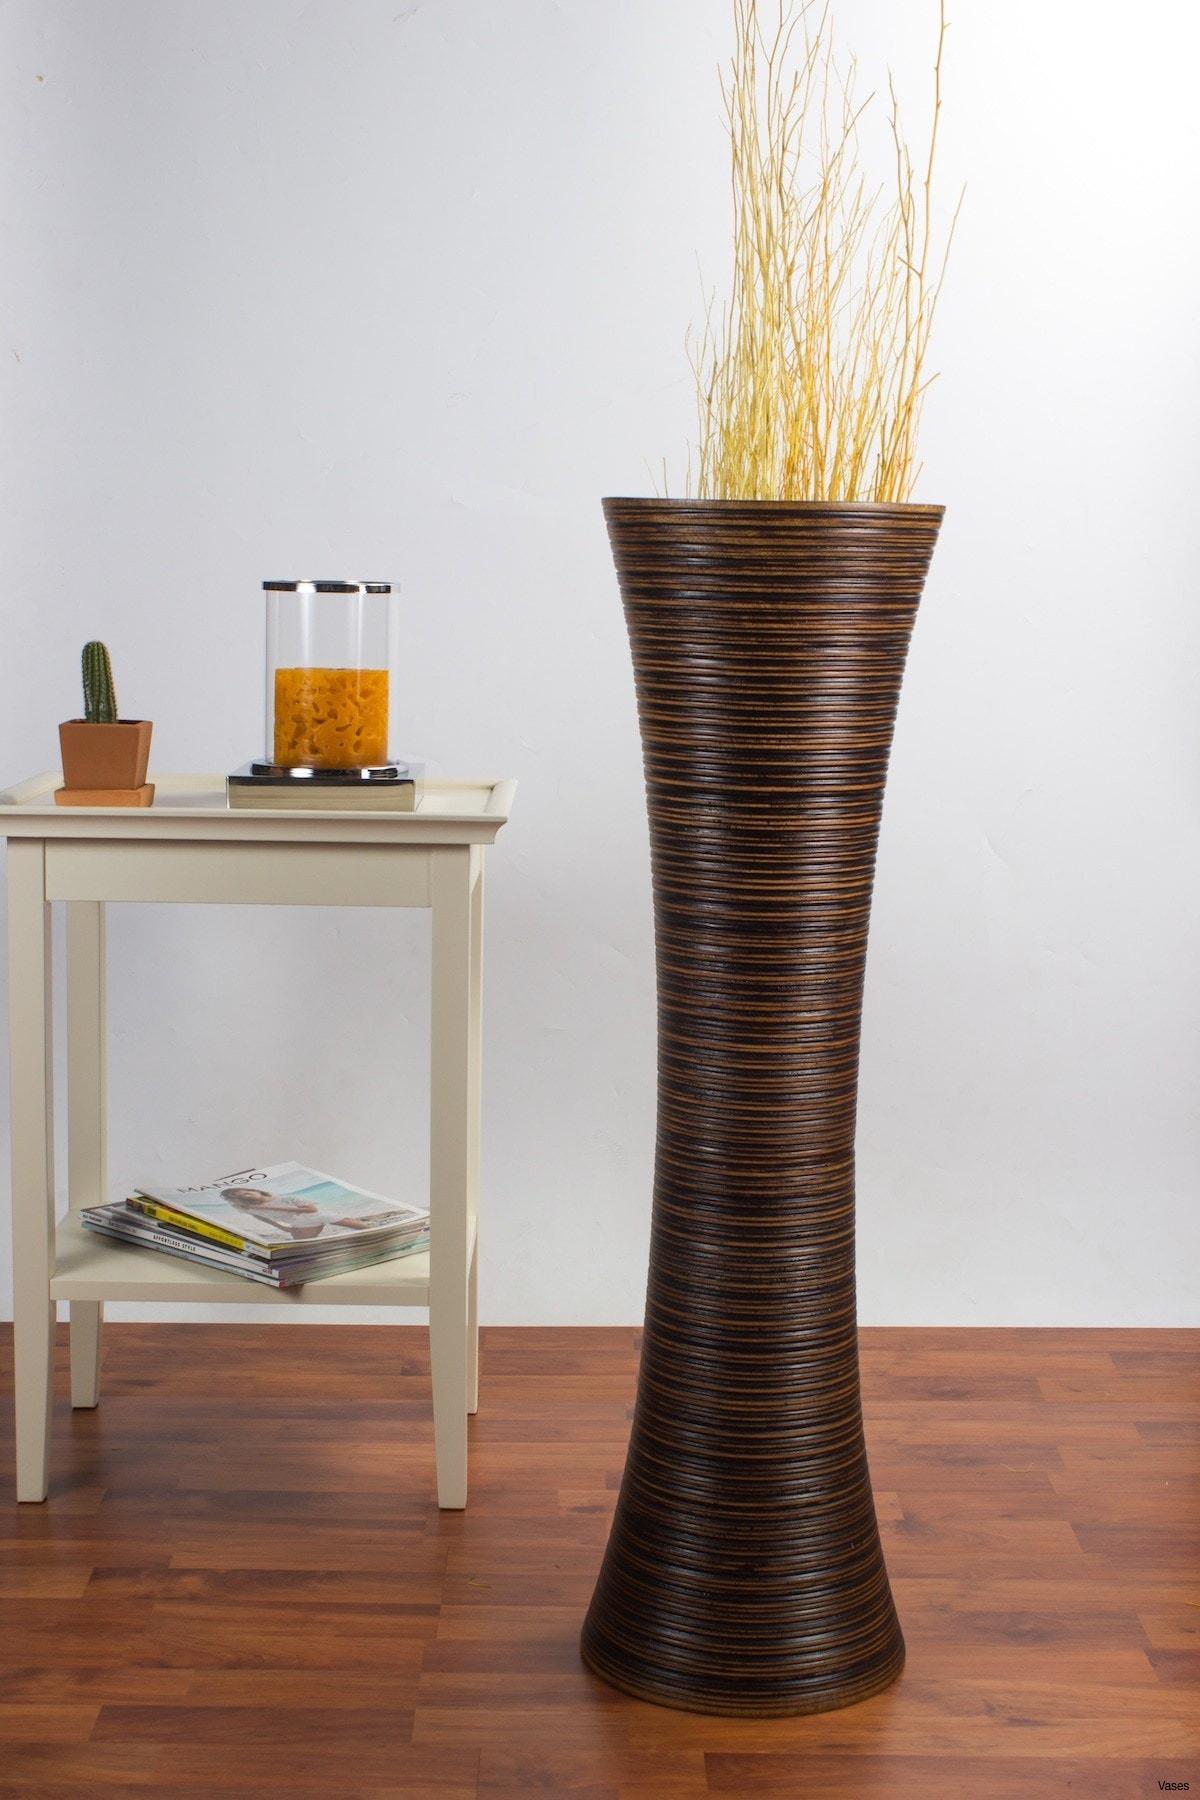 lenox vases prices of brown floor vase image decorative floor vases fresh d dkbrw 5749 1h with regard to brown floor vase collection decorative floor vases fresh d dkbrw 5749 1h vases tall brown i